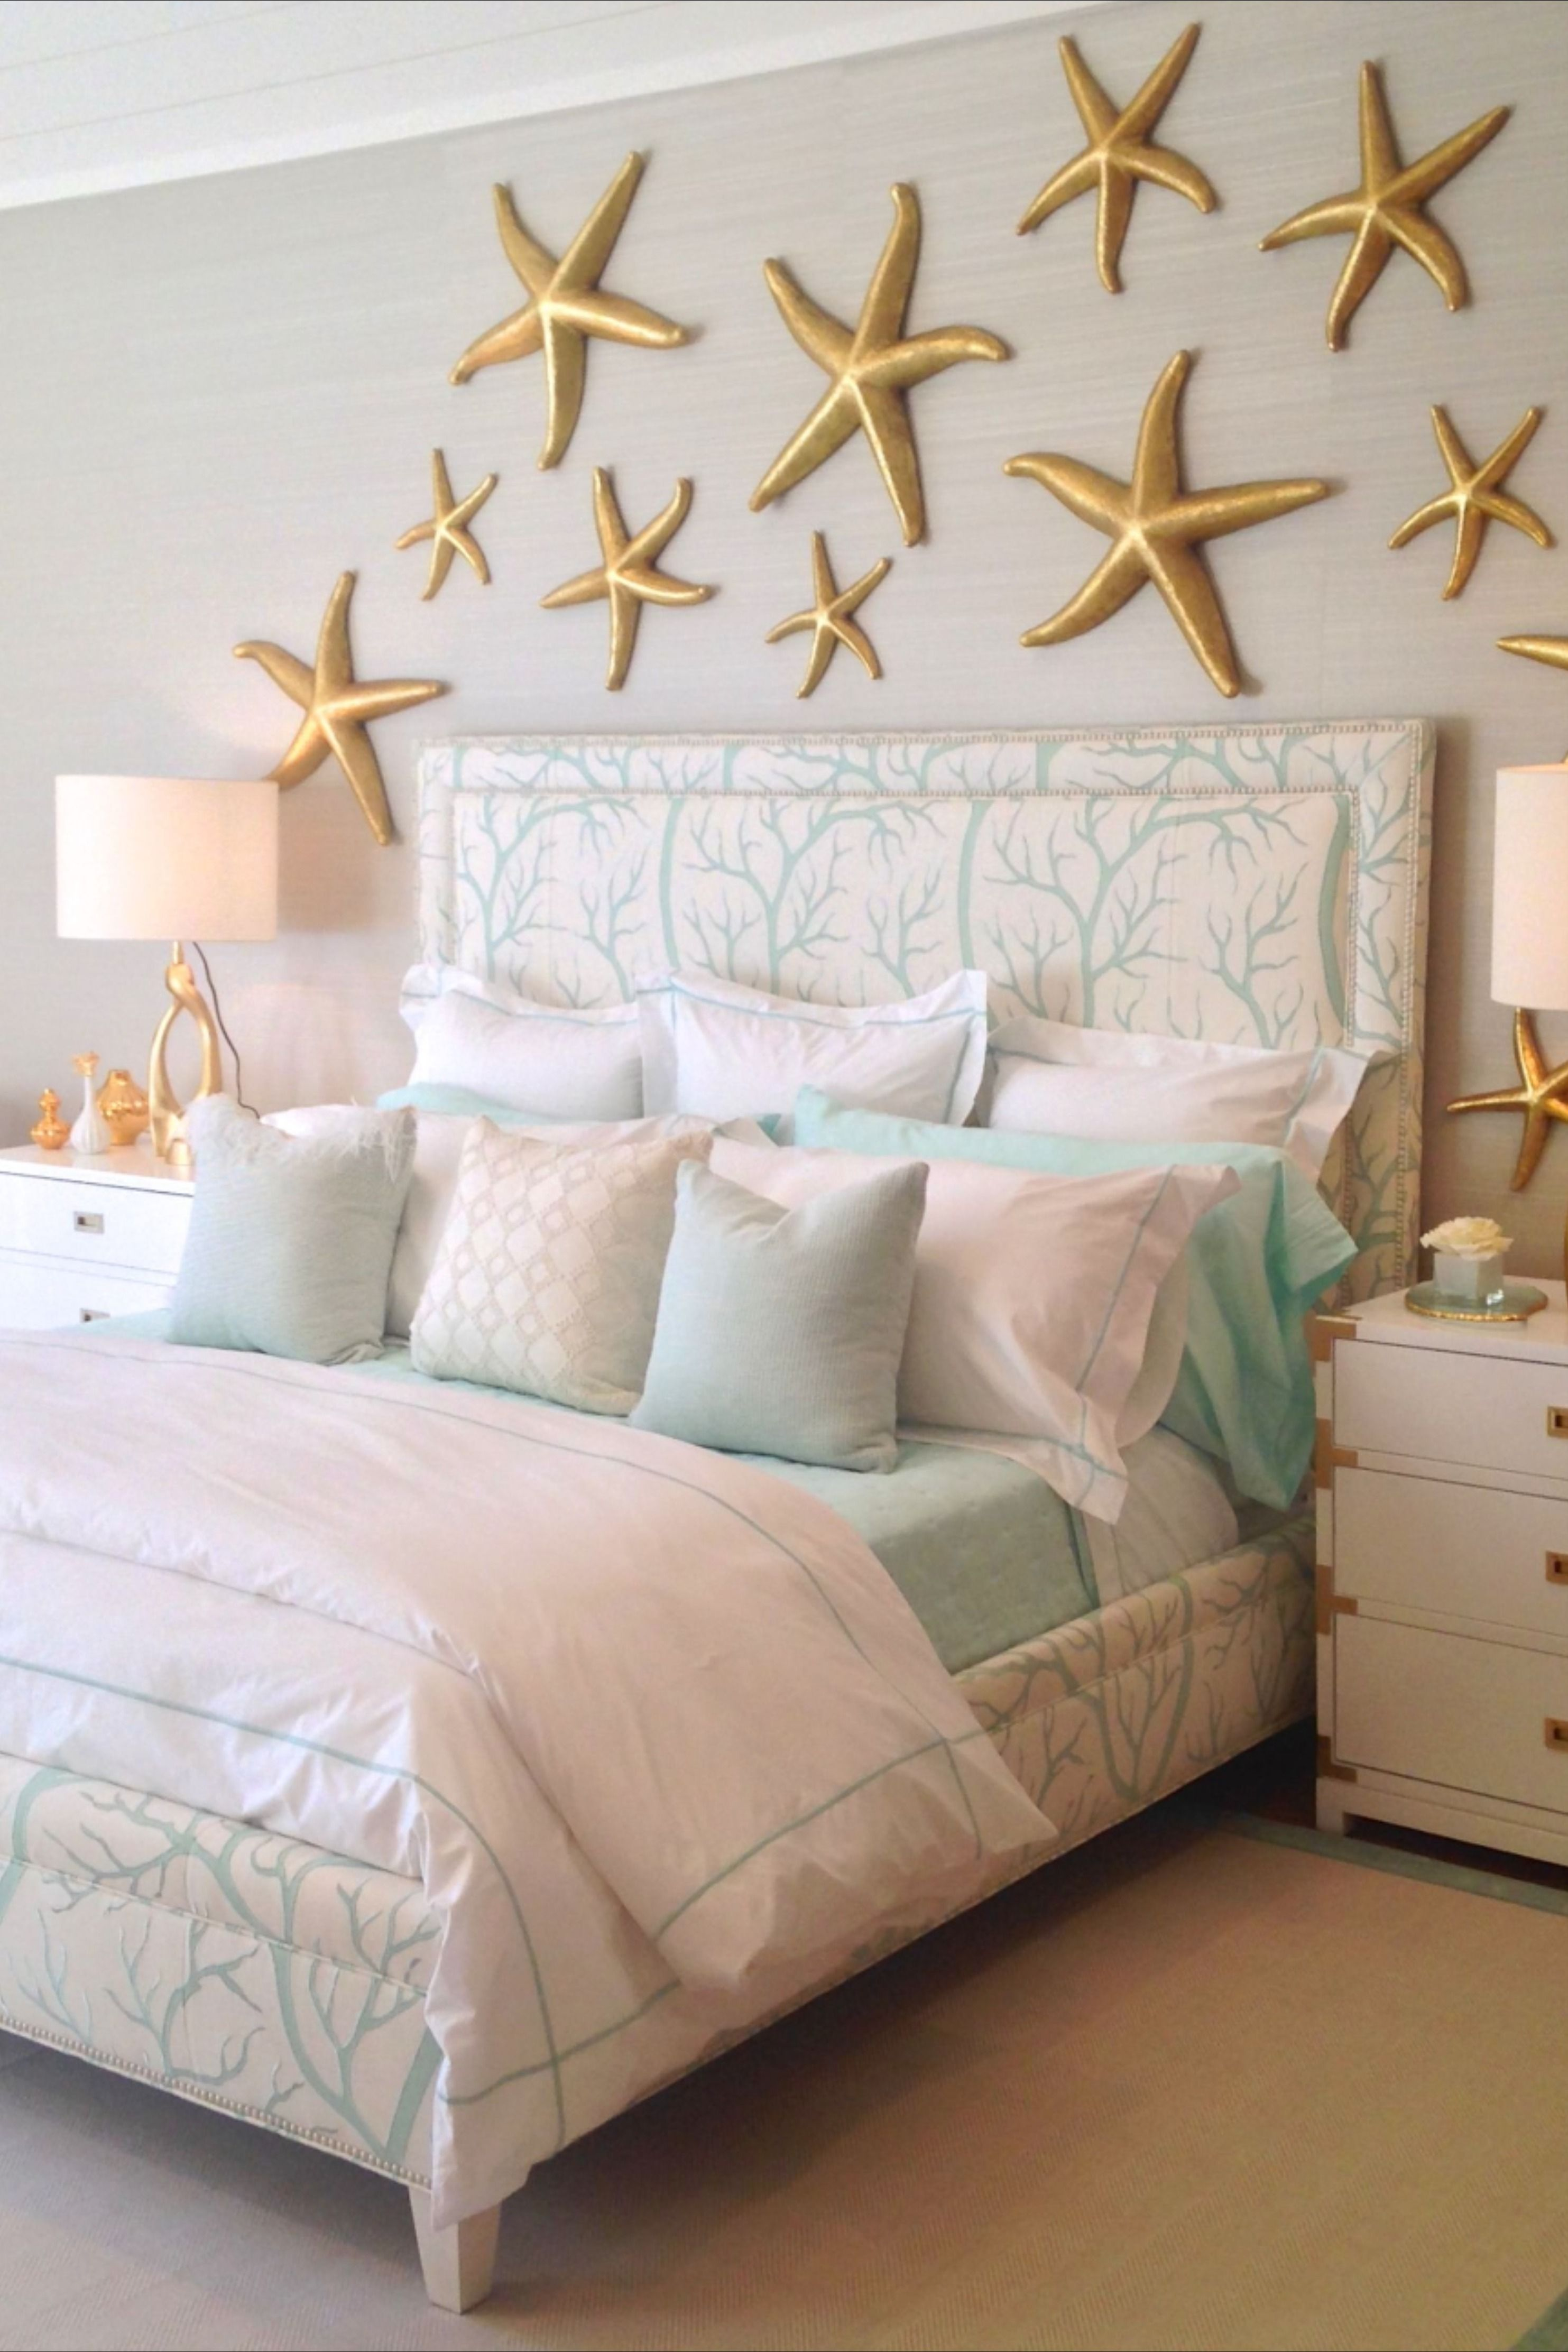 Beach Bedroom Ideas Web Visit Room Decor In 2020 Bedroom Ideas